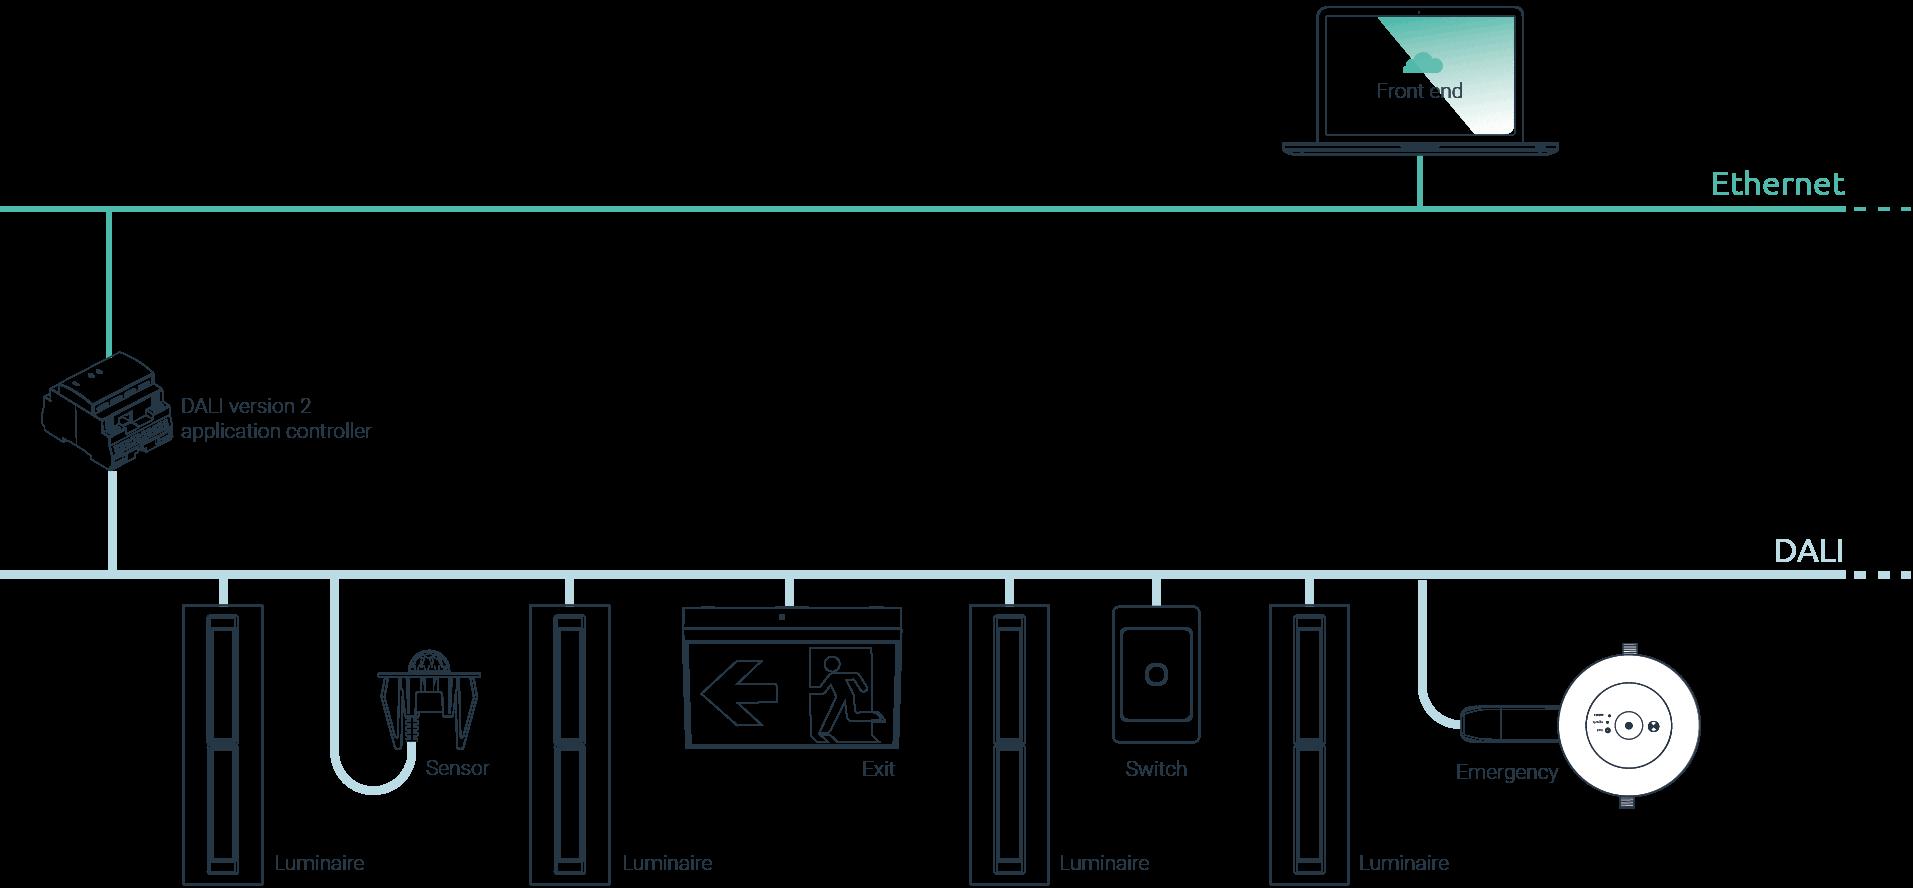 DALI Version 2 - simplifies the wiring